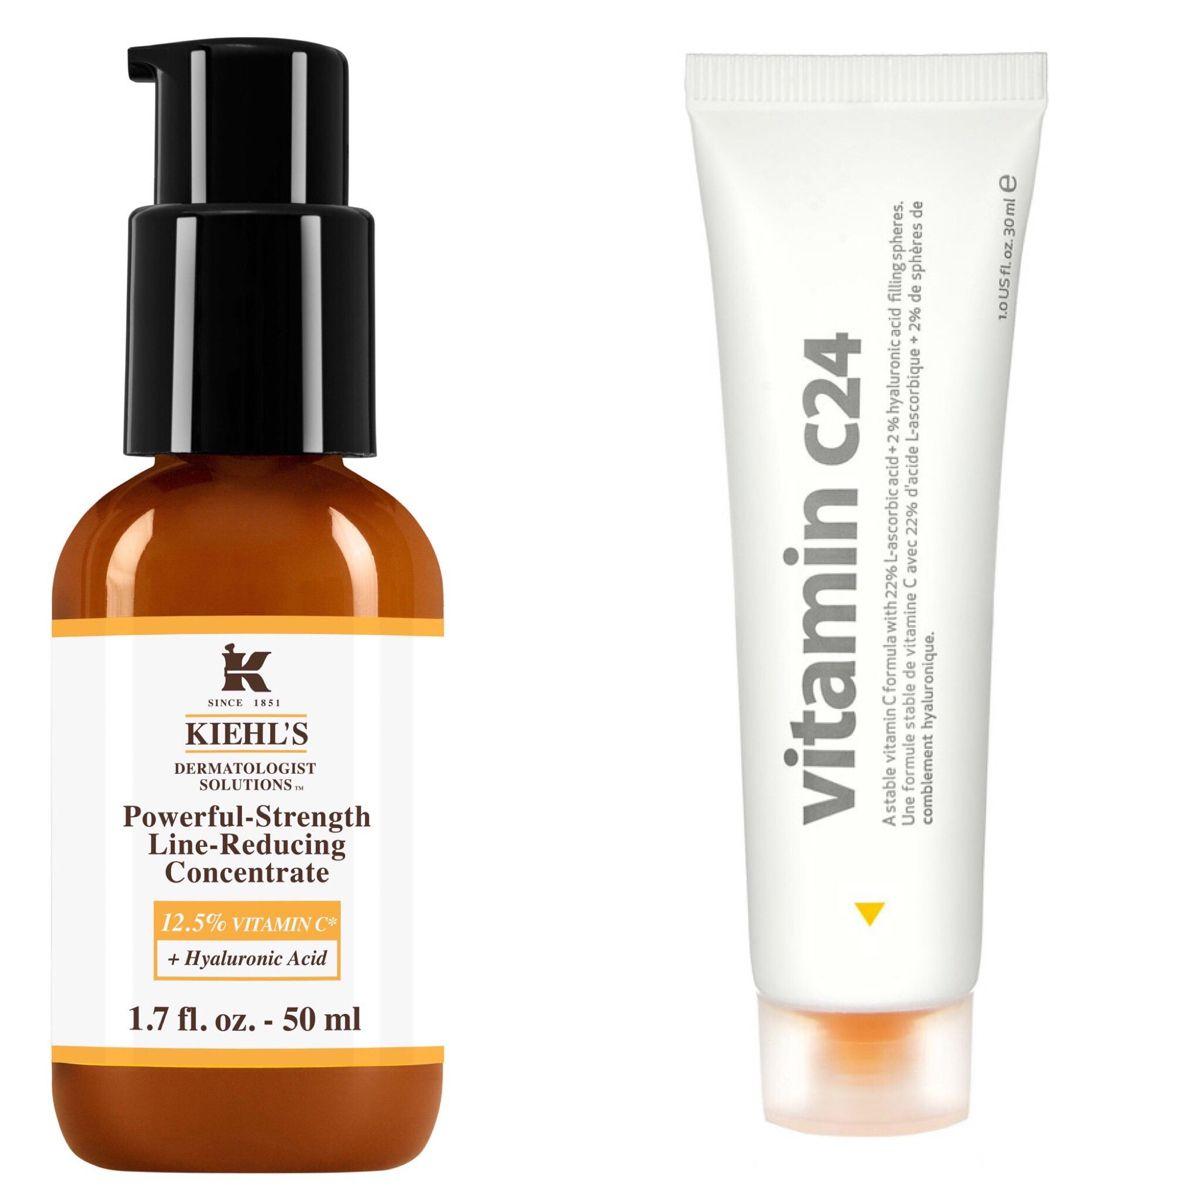 Vit C Skincare Dupe Alert In 2020 Skincare Dupes Skin Care Skin Care Secrets